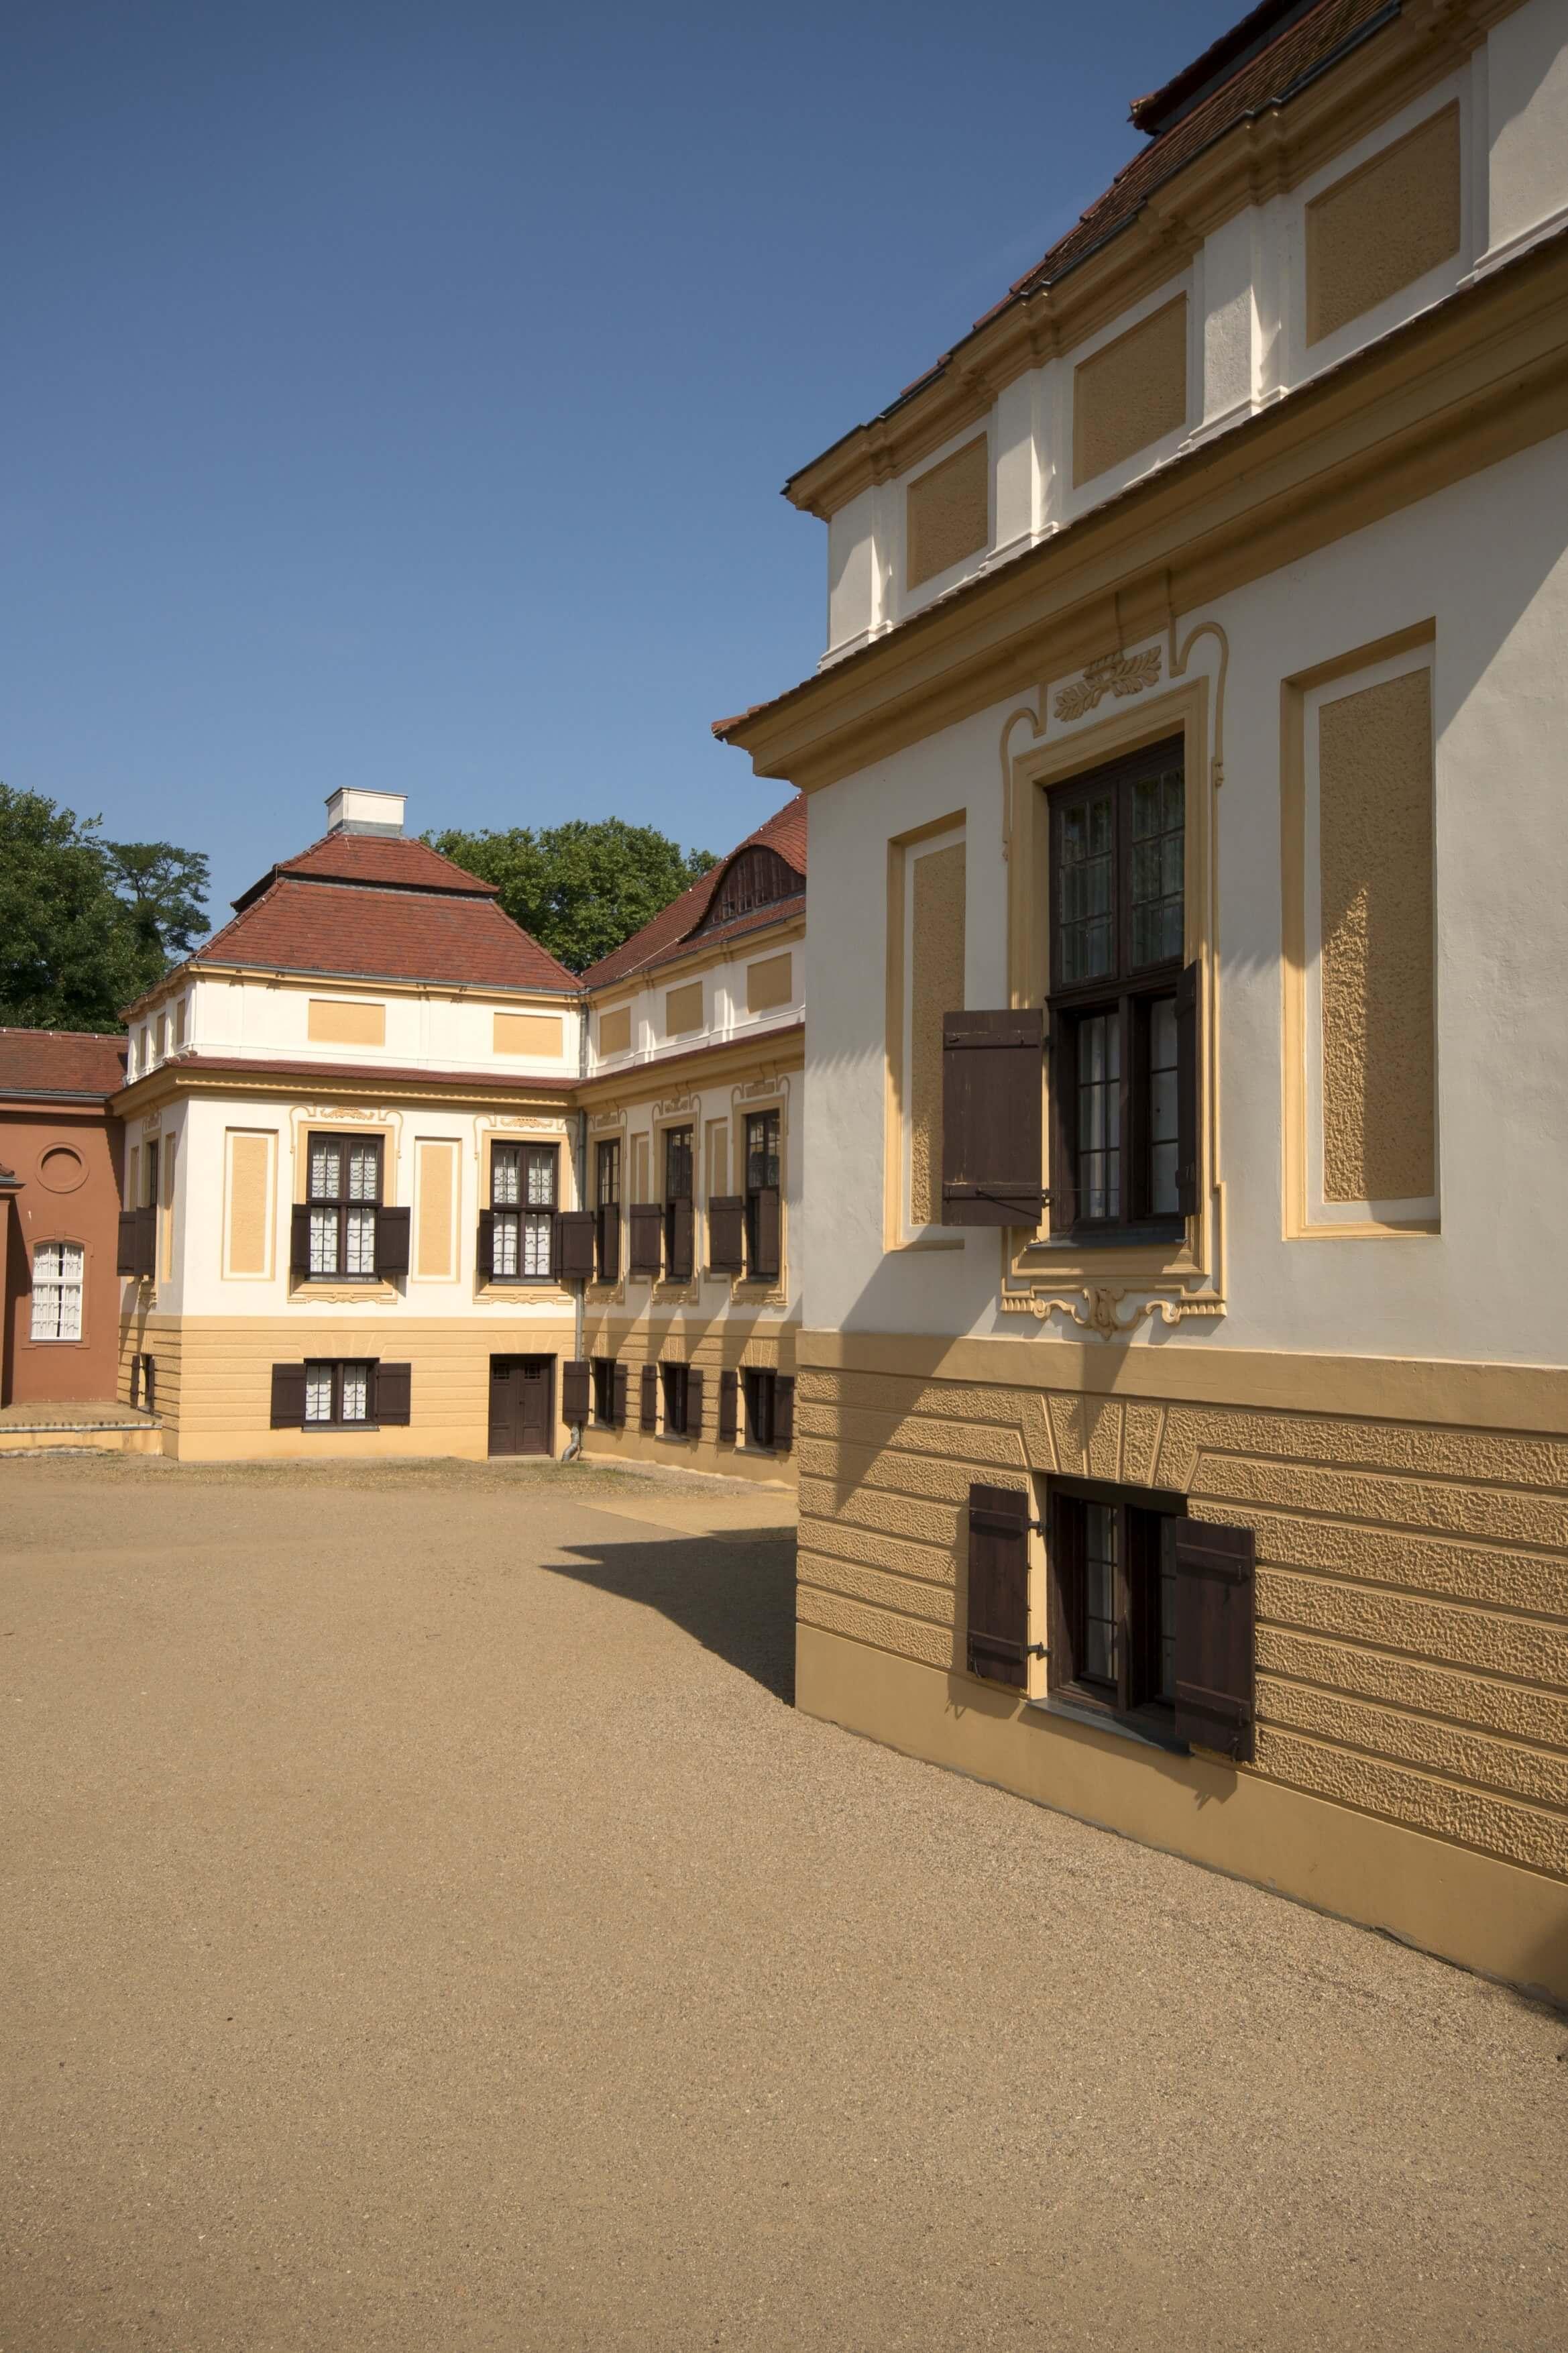 Schloss Caputh - 14548 Caputh